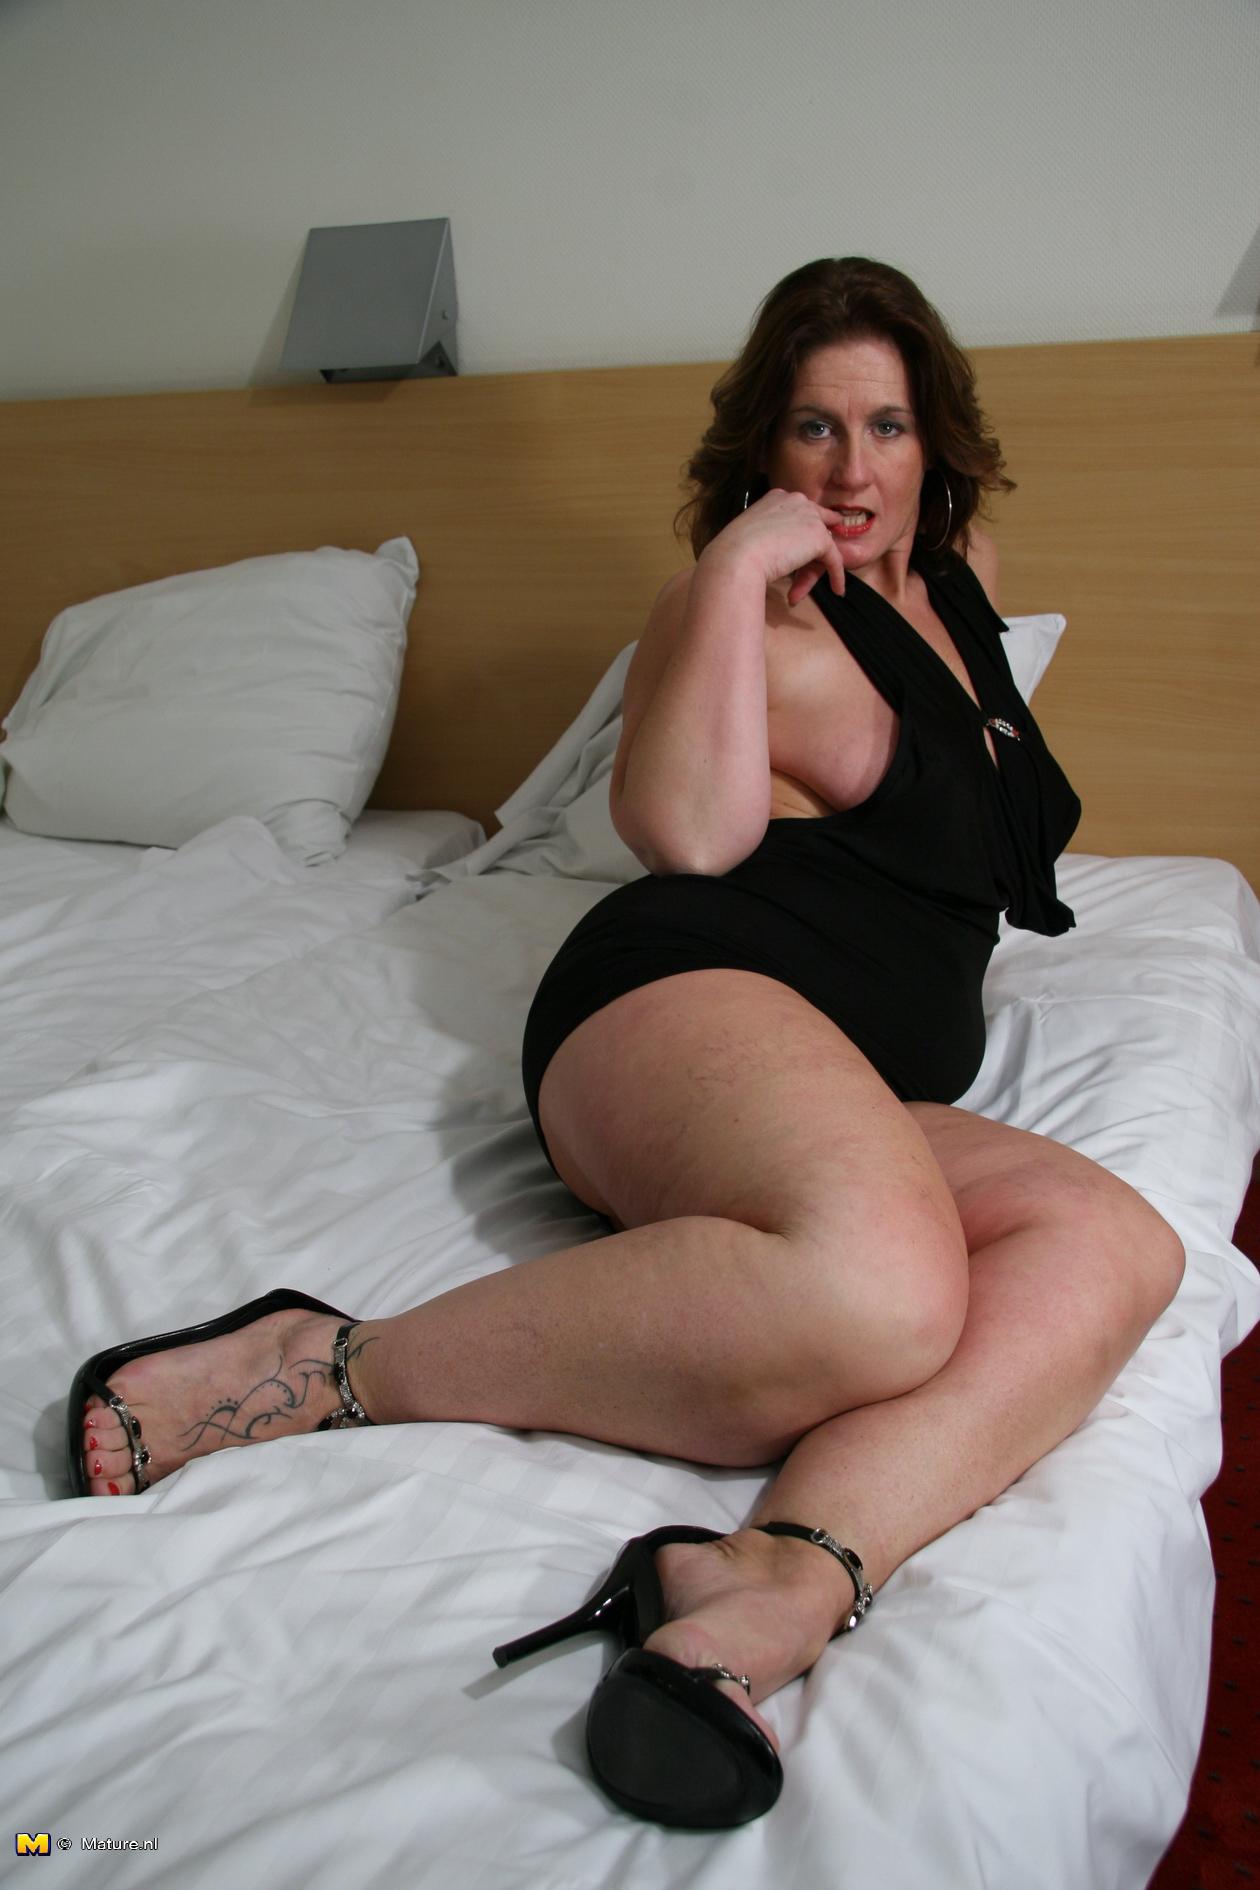 milf sexy wife fucking pics